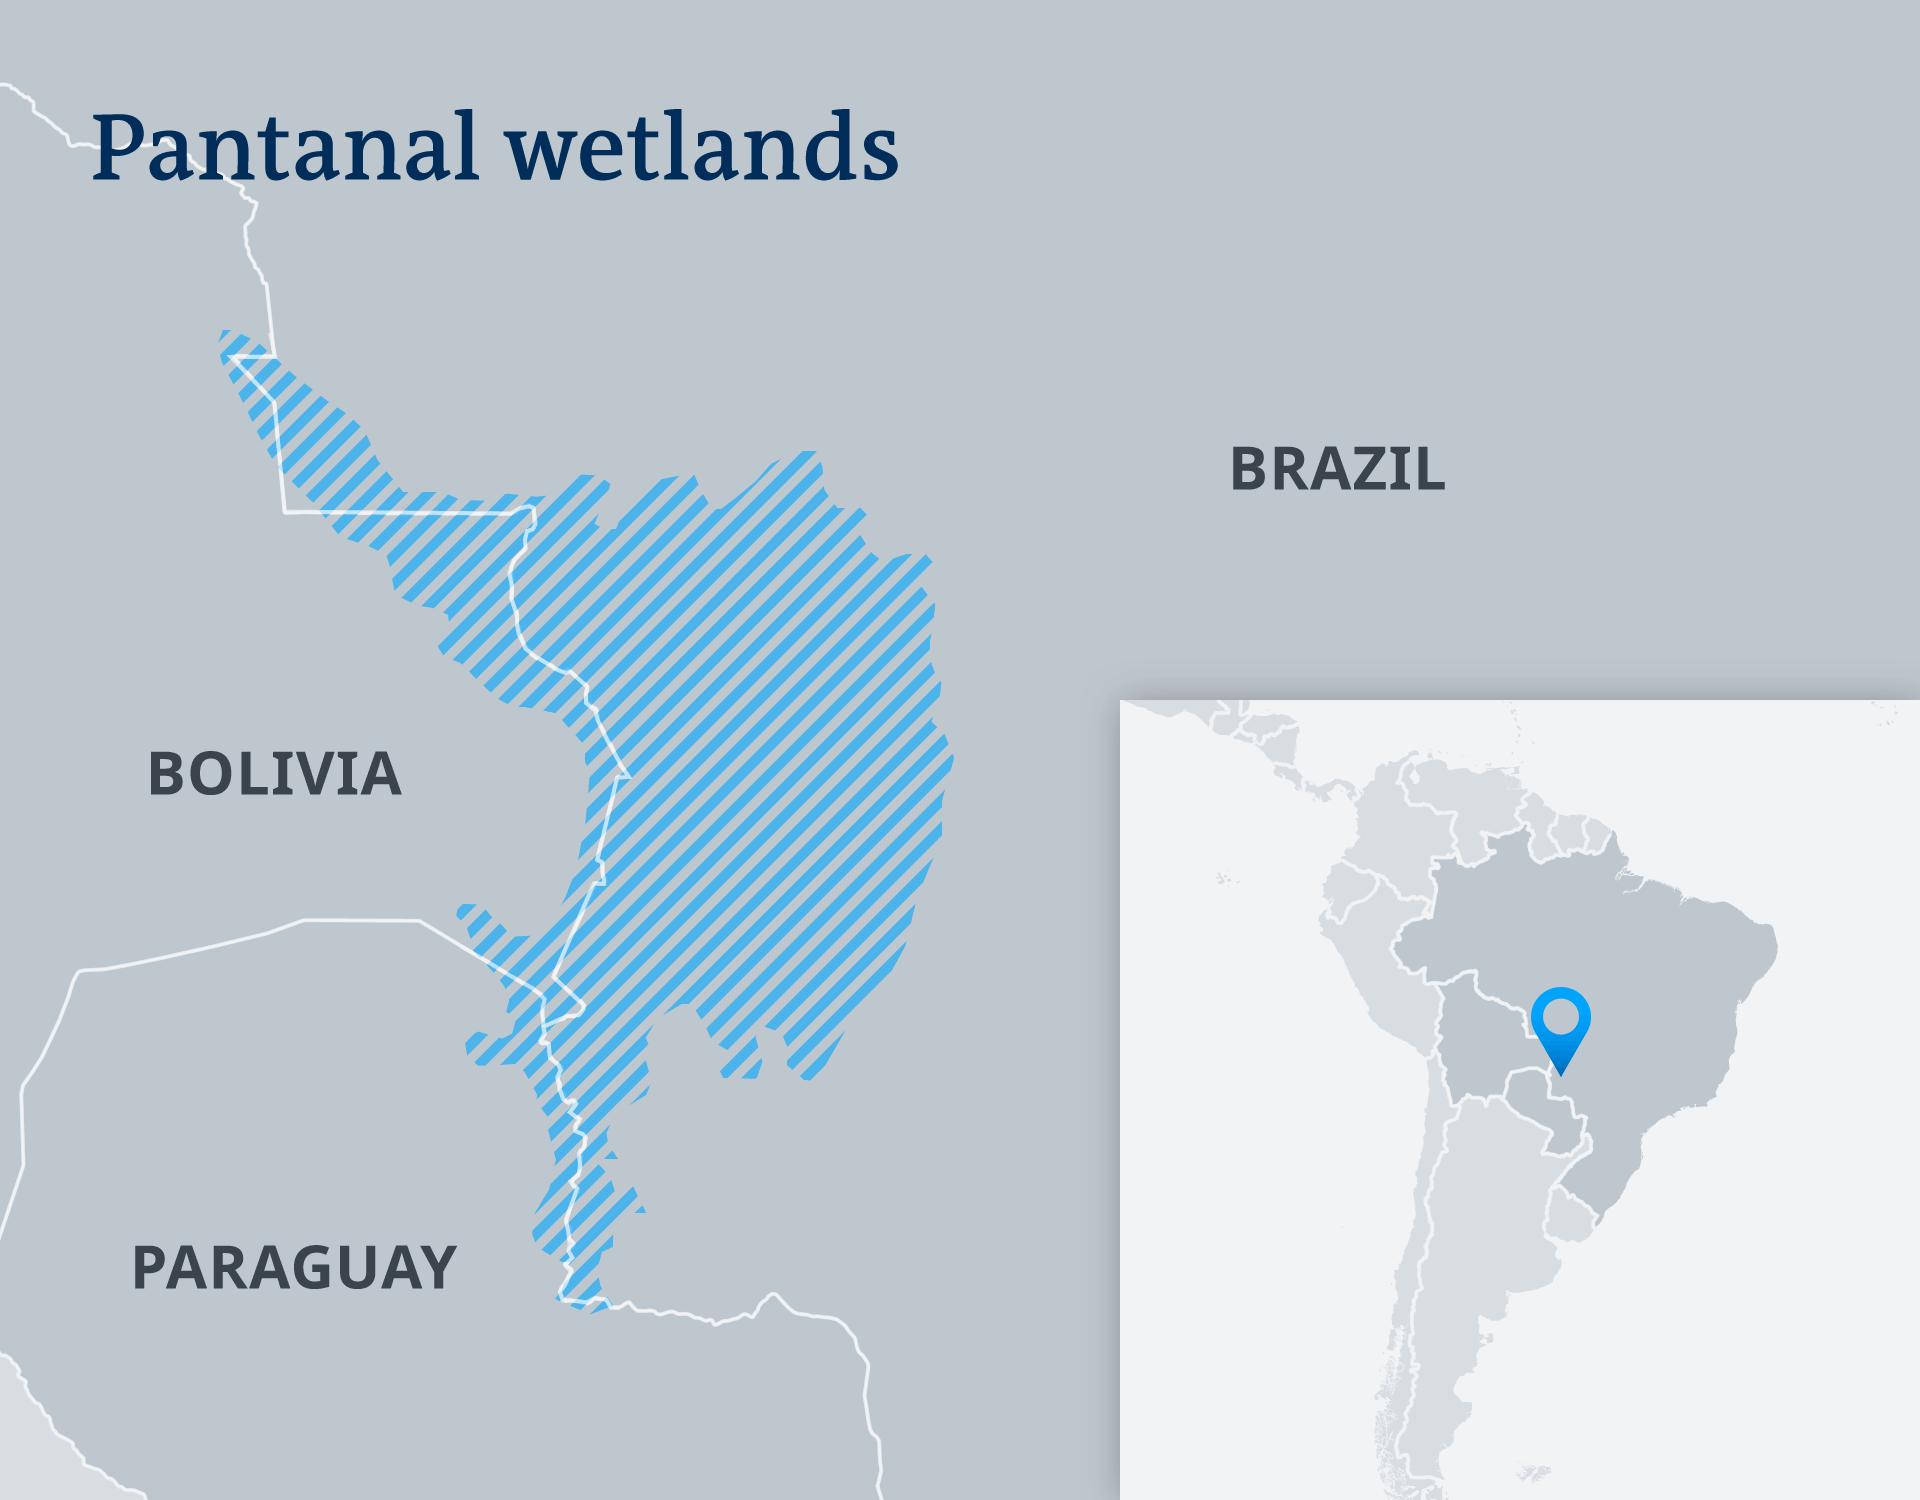 Map of Pantanal wetlands